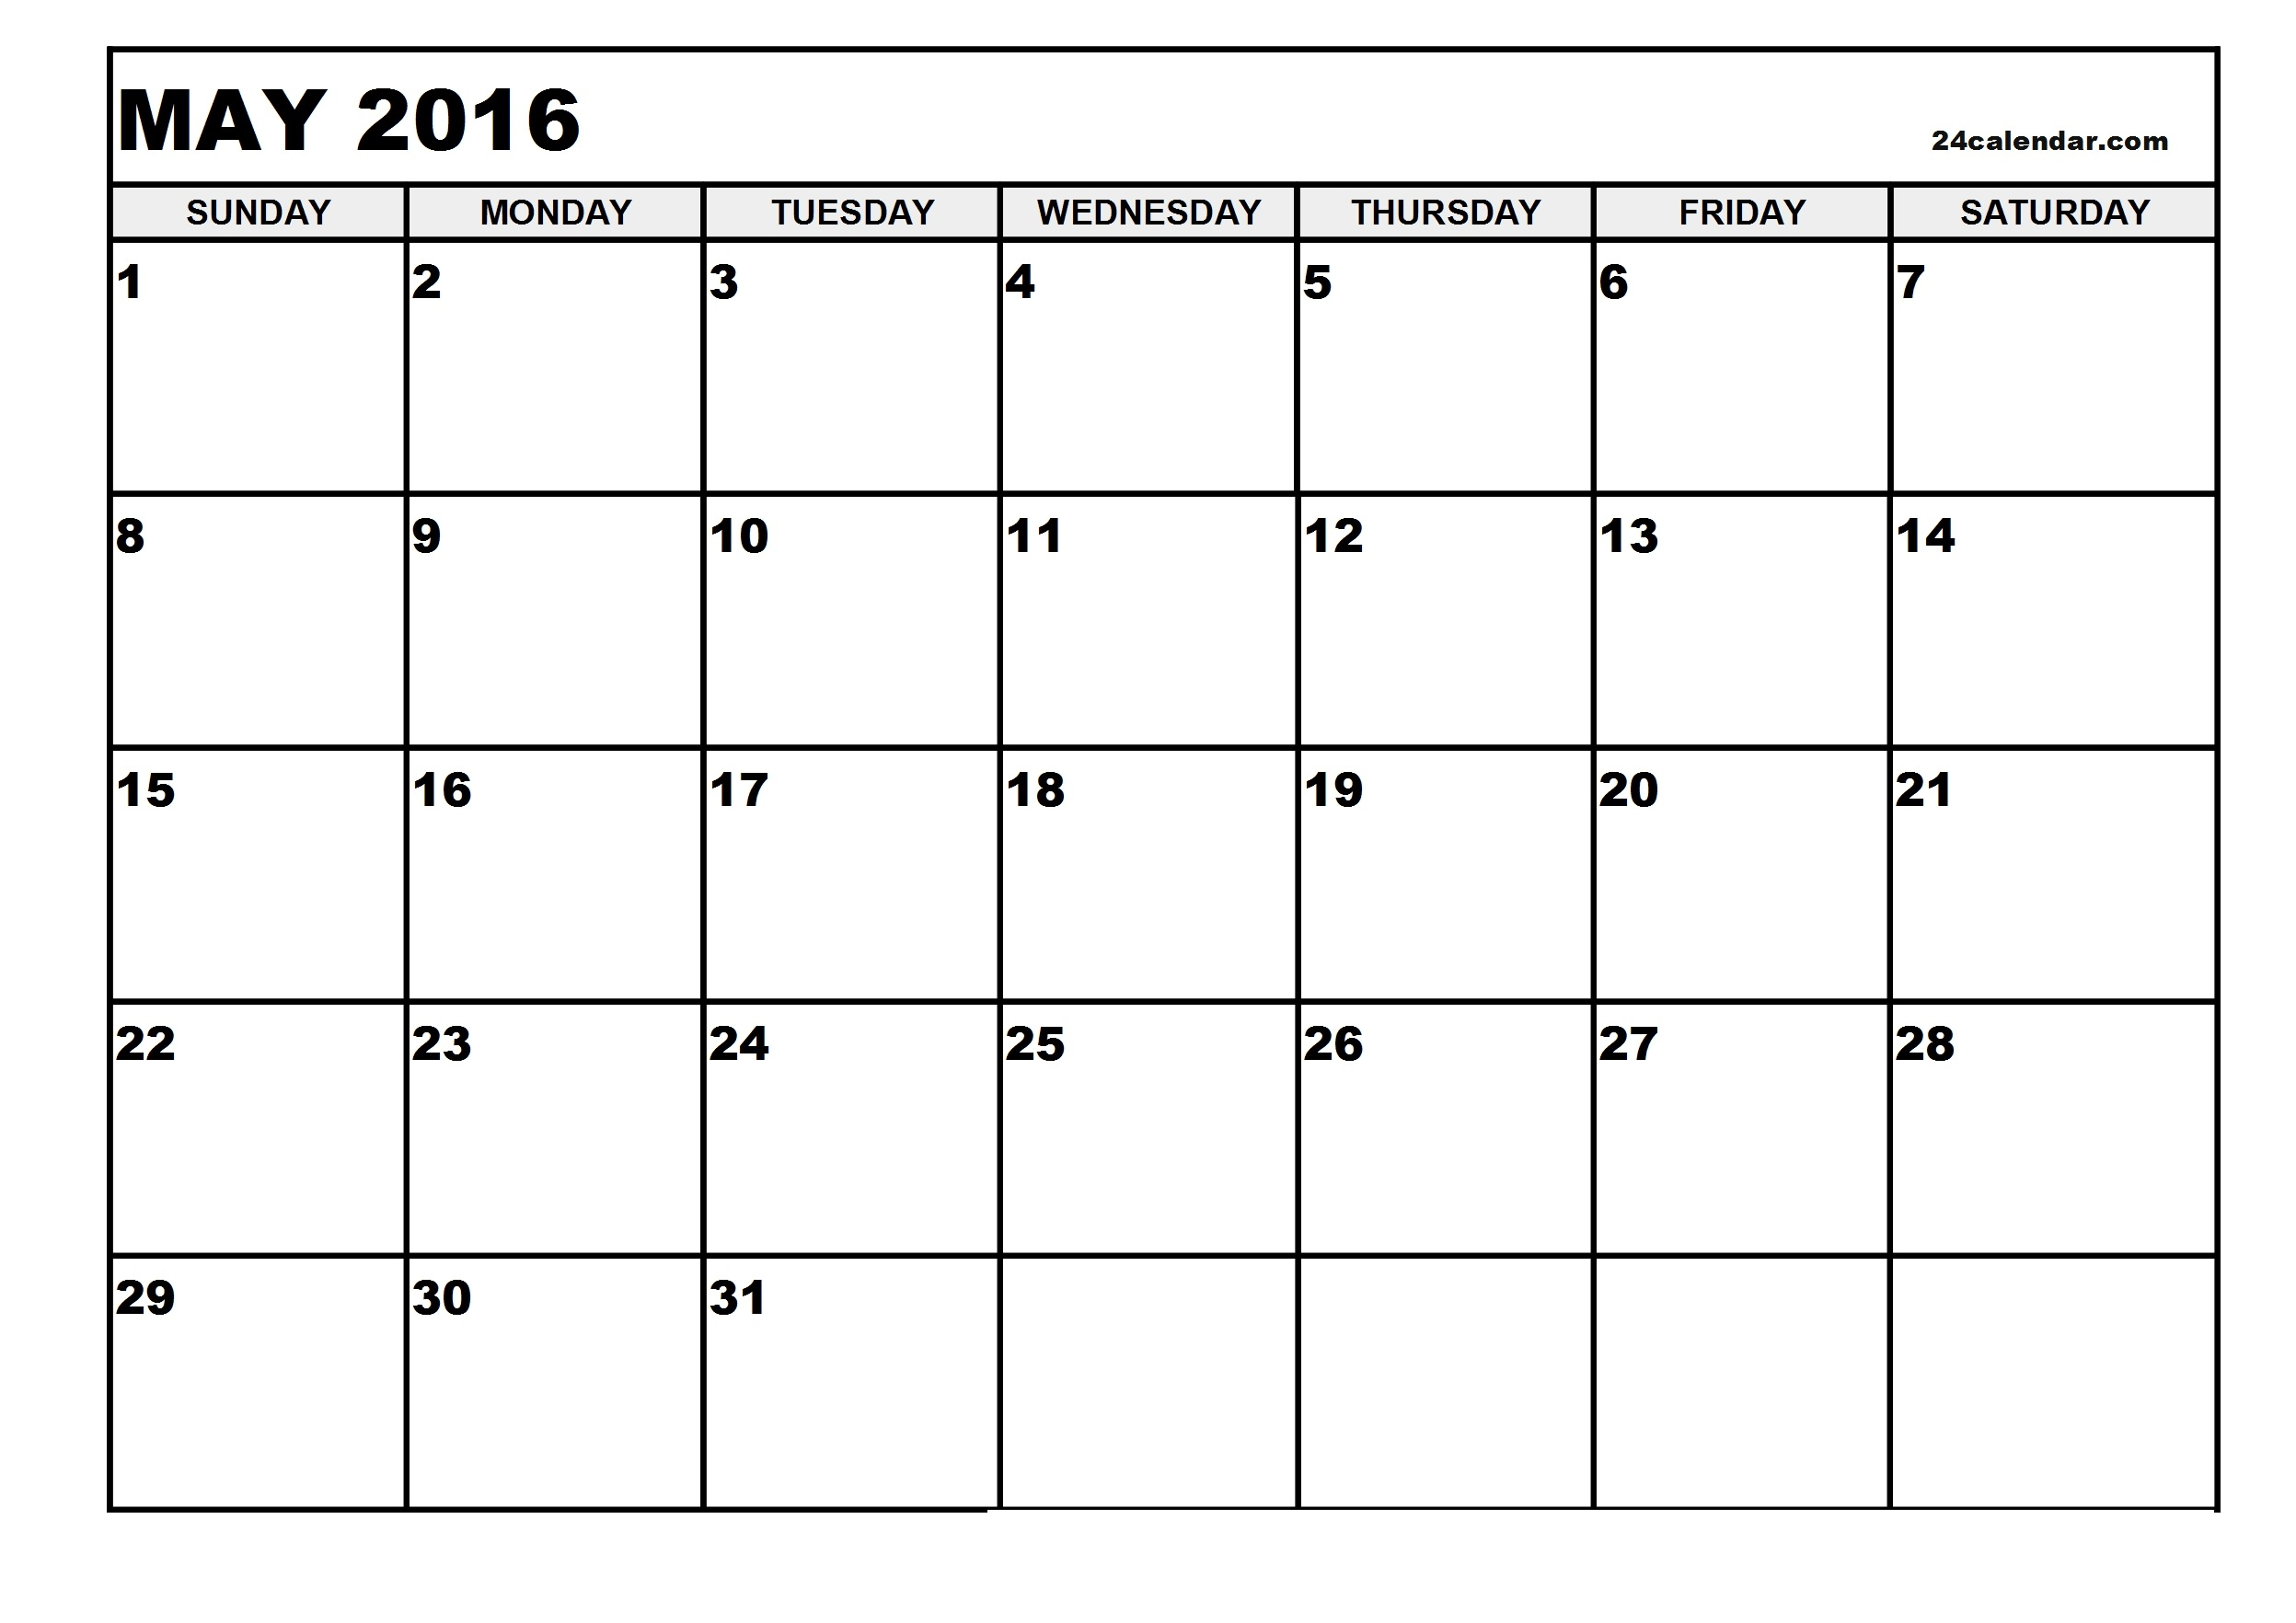 may 2017 printable calendar landscape a4 portrait printable calendar templates. Black Bedroom Furniture Sets. Home Design Ideas